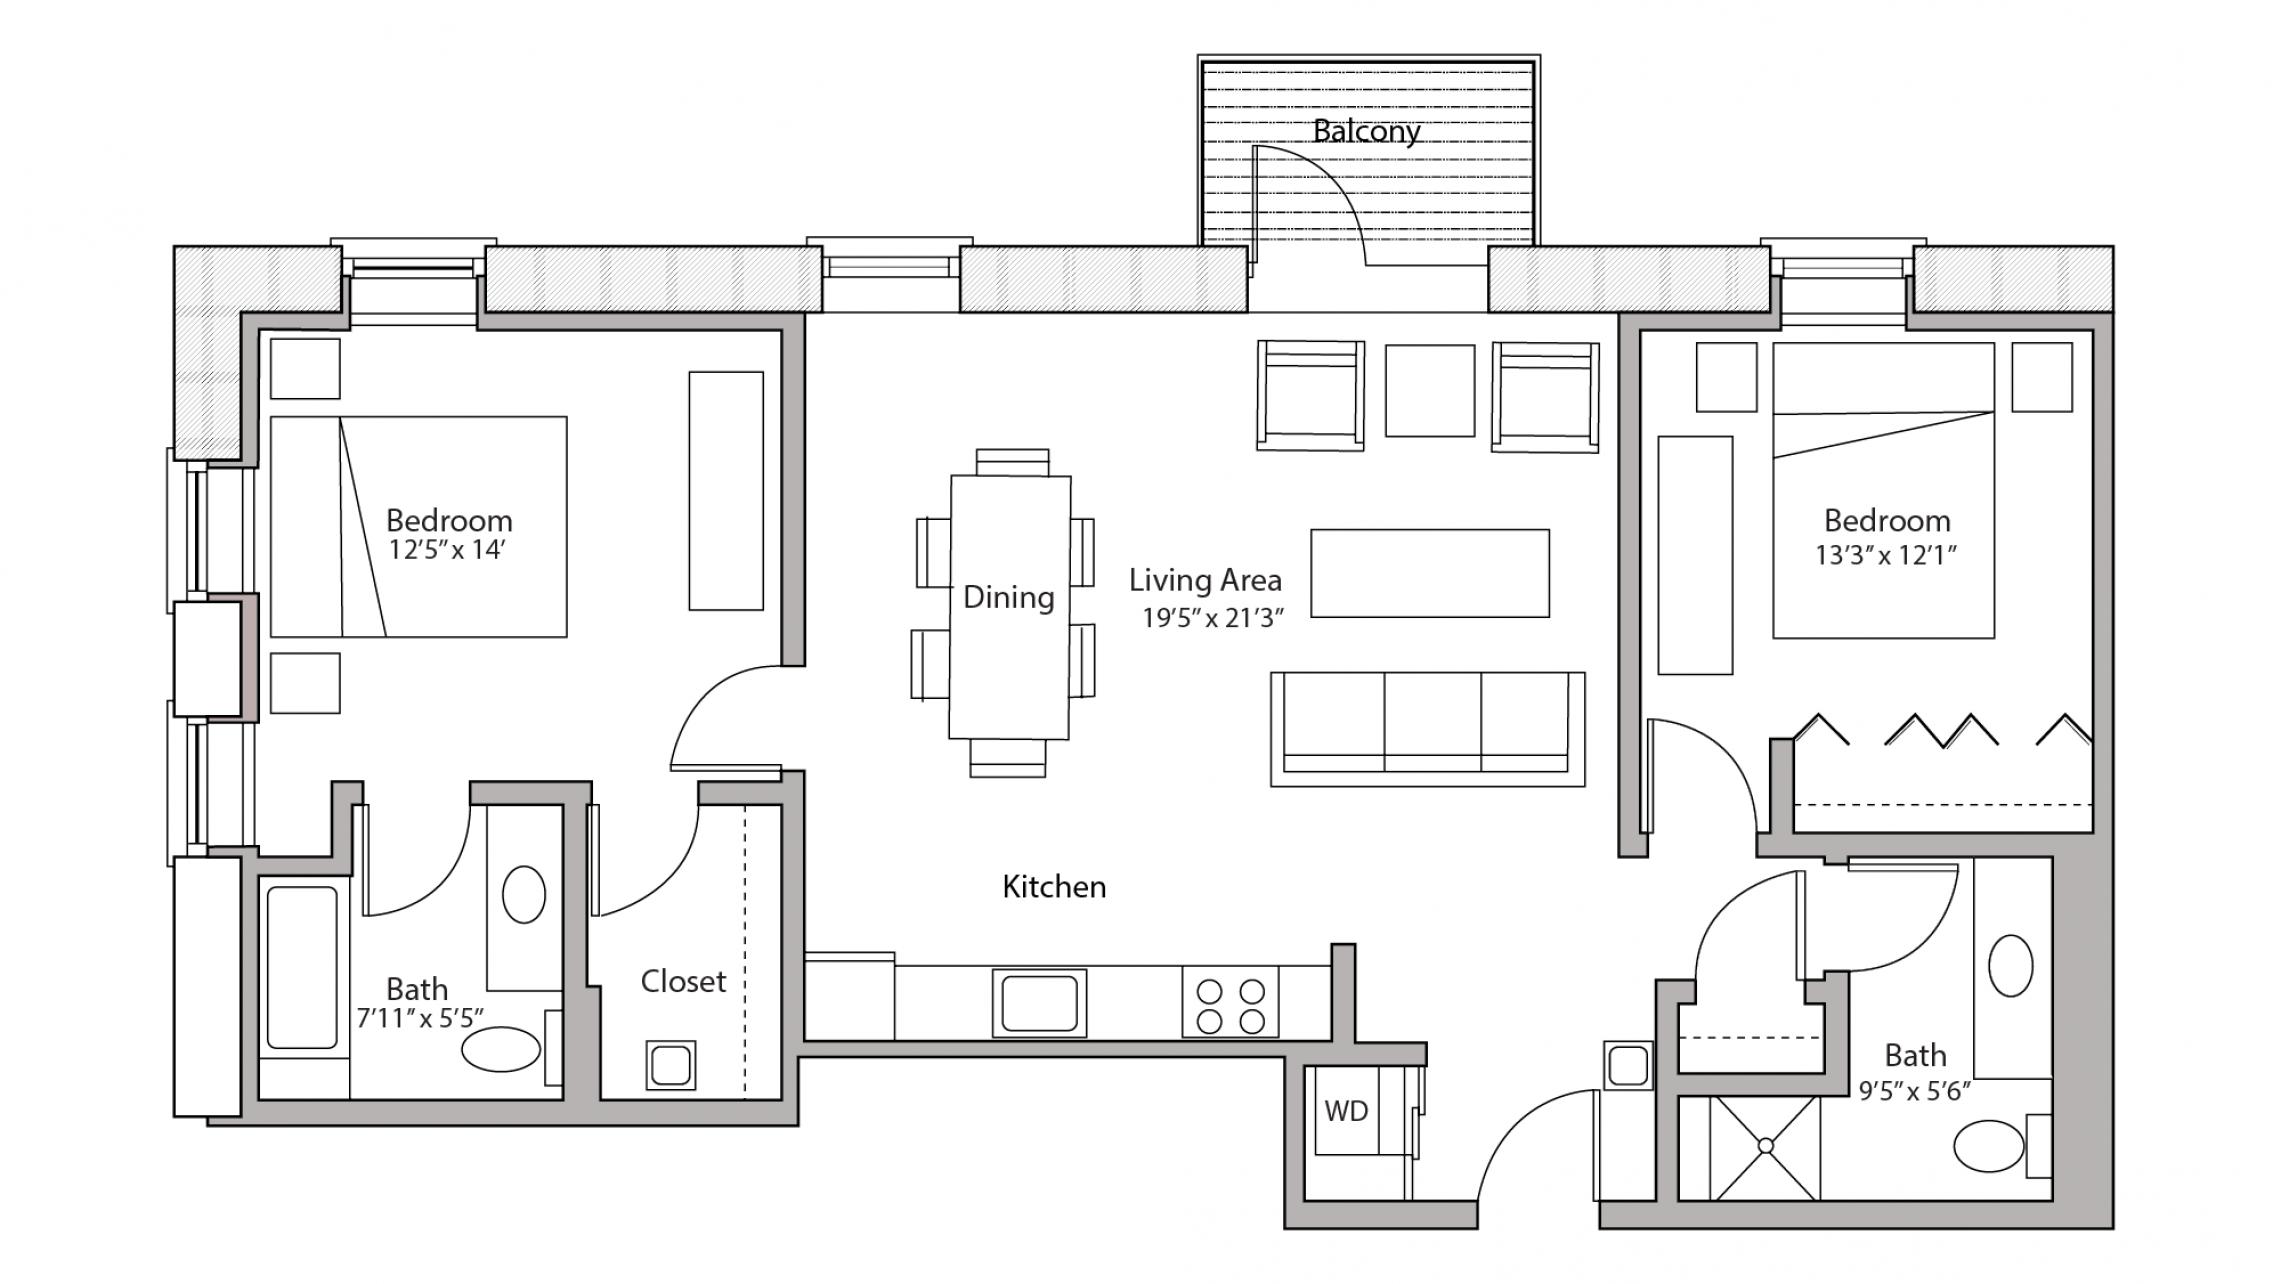 ULI Tobacco Lofts E213 - Two Bedroom, Two Bathroom